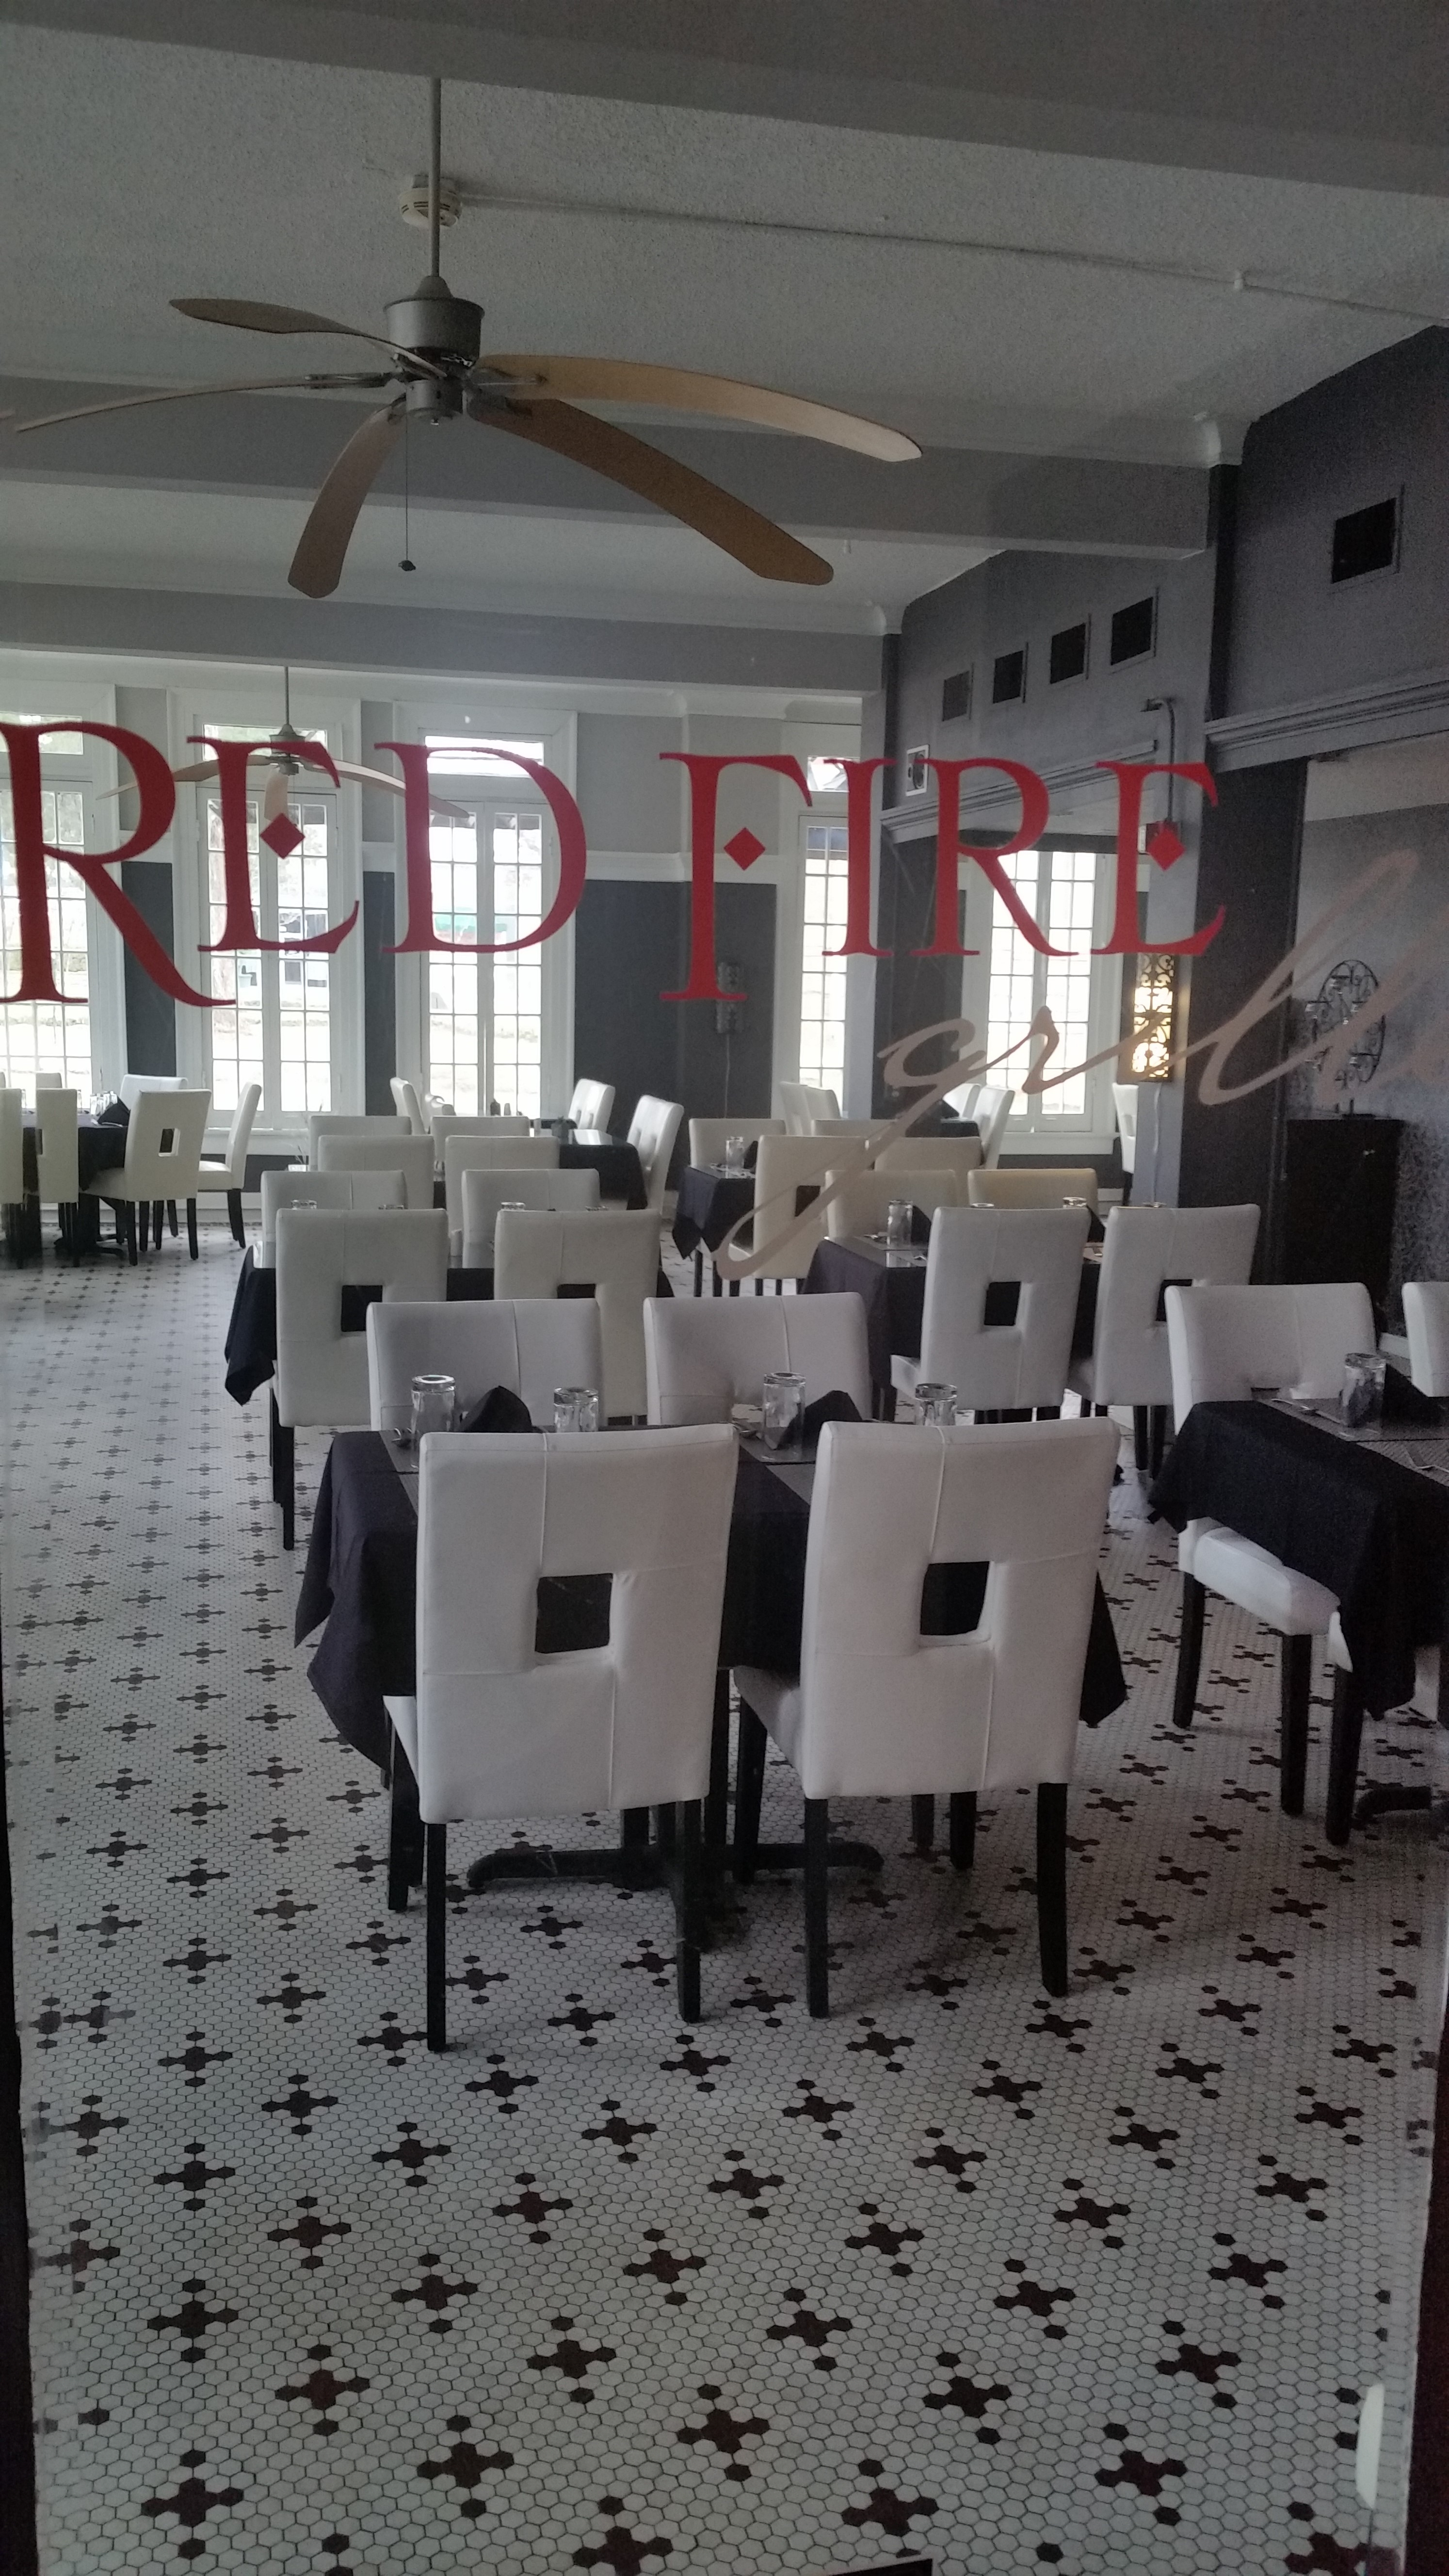 redlands red fire